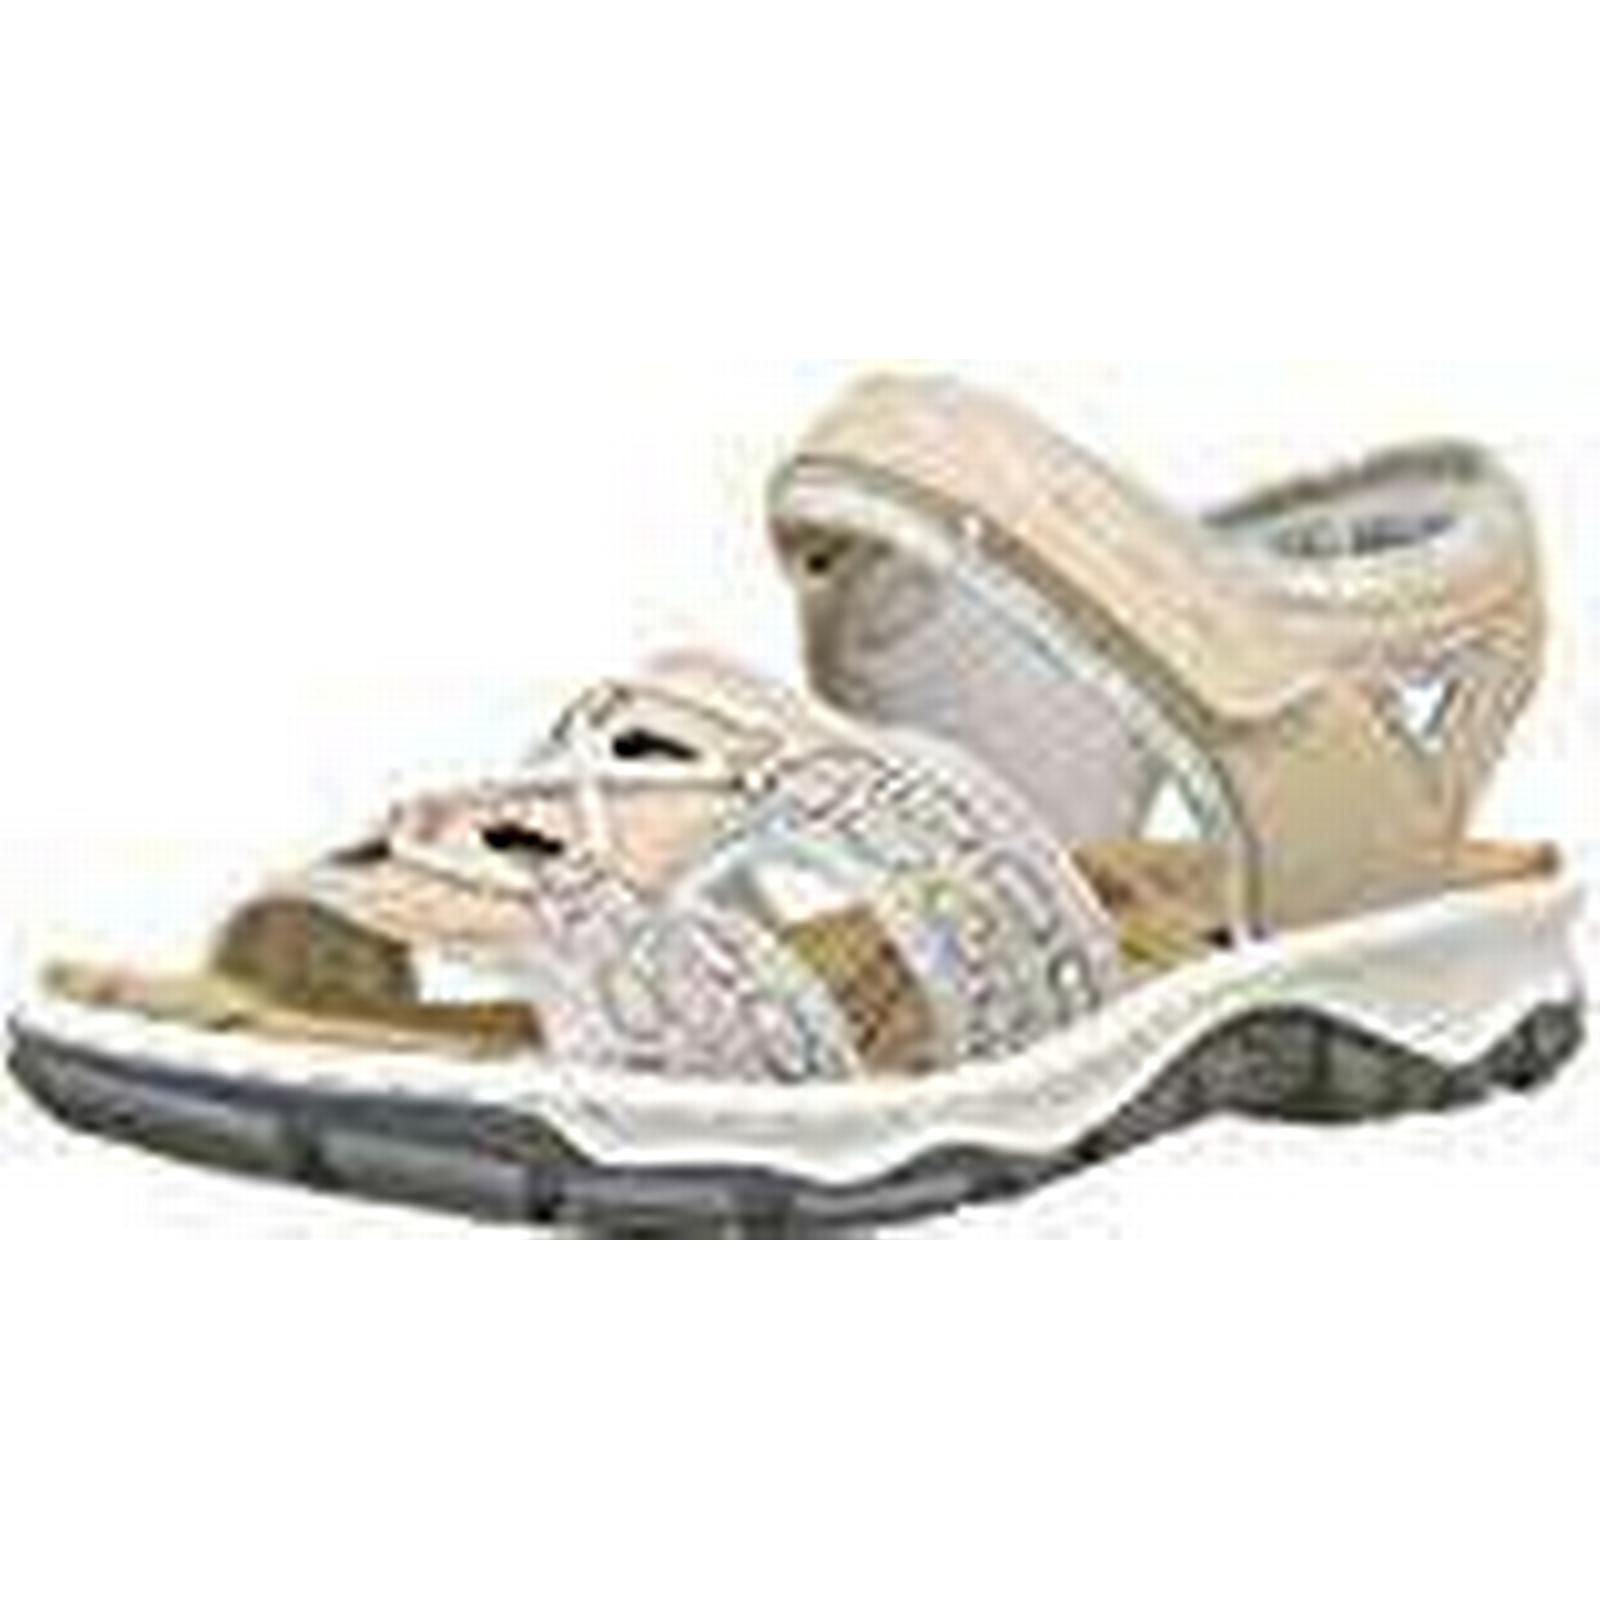 Rieker Women's 68865 Closed Toe 5 Sandals, Pink (rosa/silverflower/Altrosa 31), 5 Toe UK 5 UK c55e1a